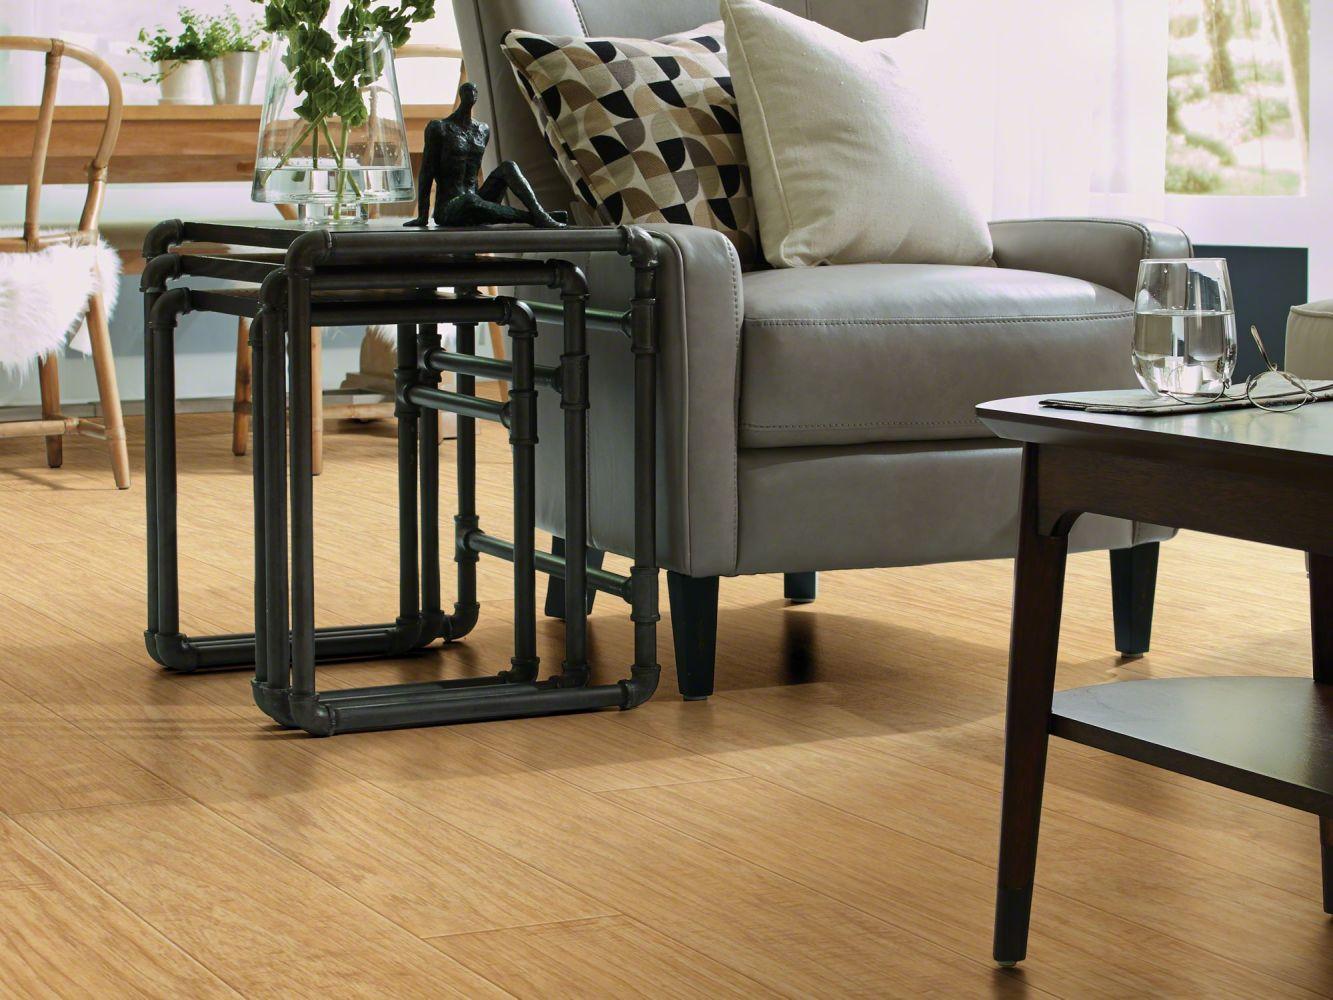 Shaw Floors Resilient Property Solutions Highlands Trailblazer 00233_VG063